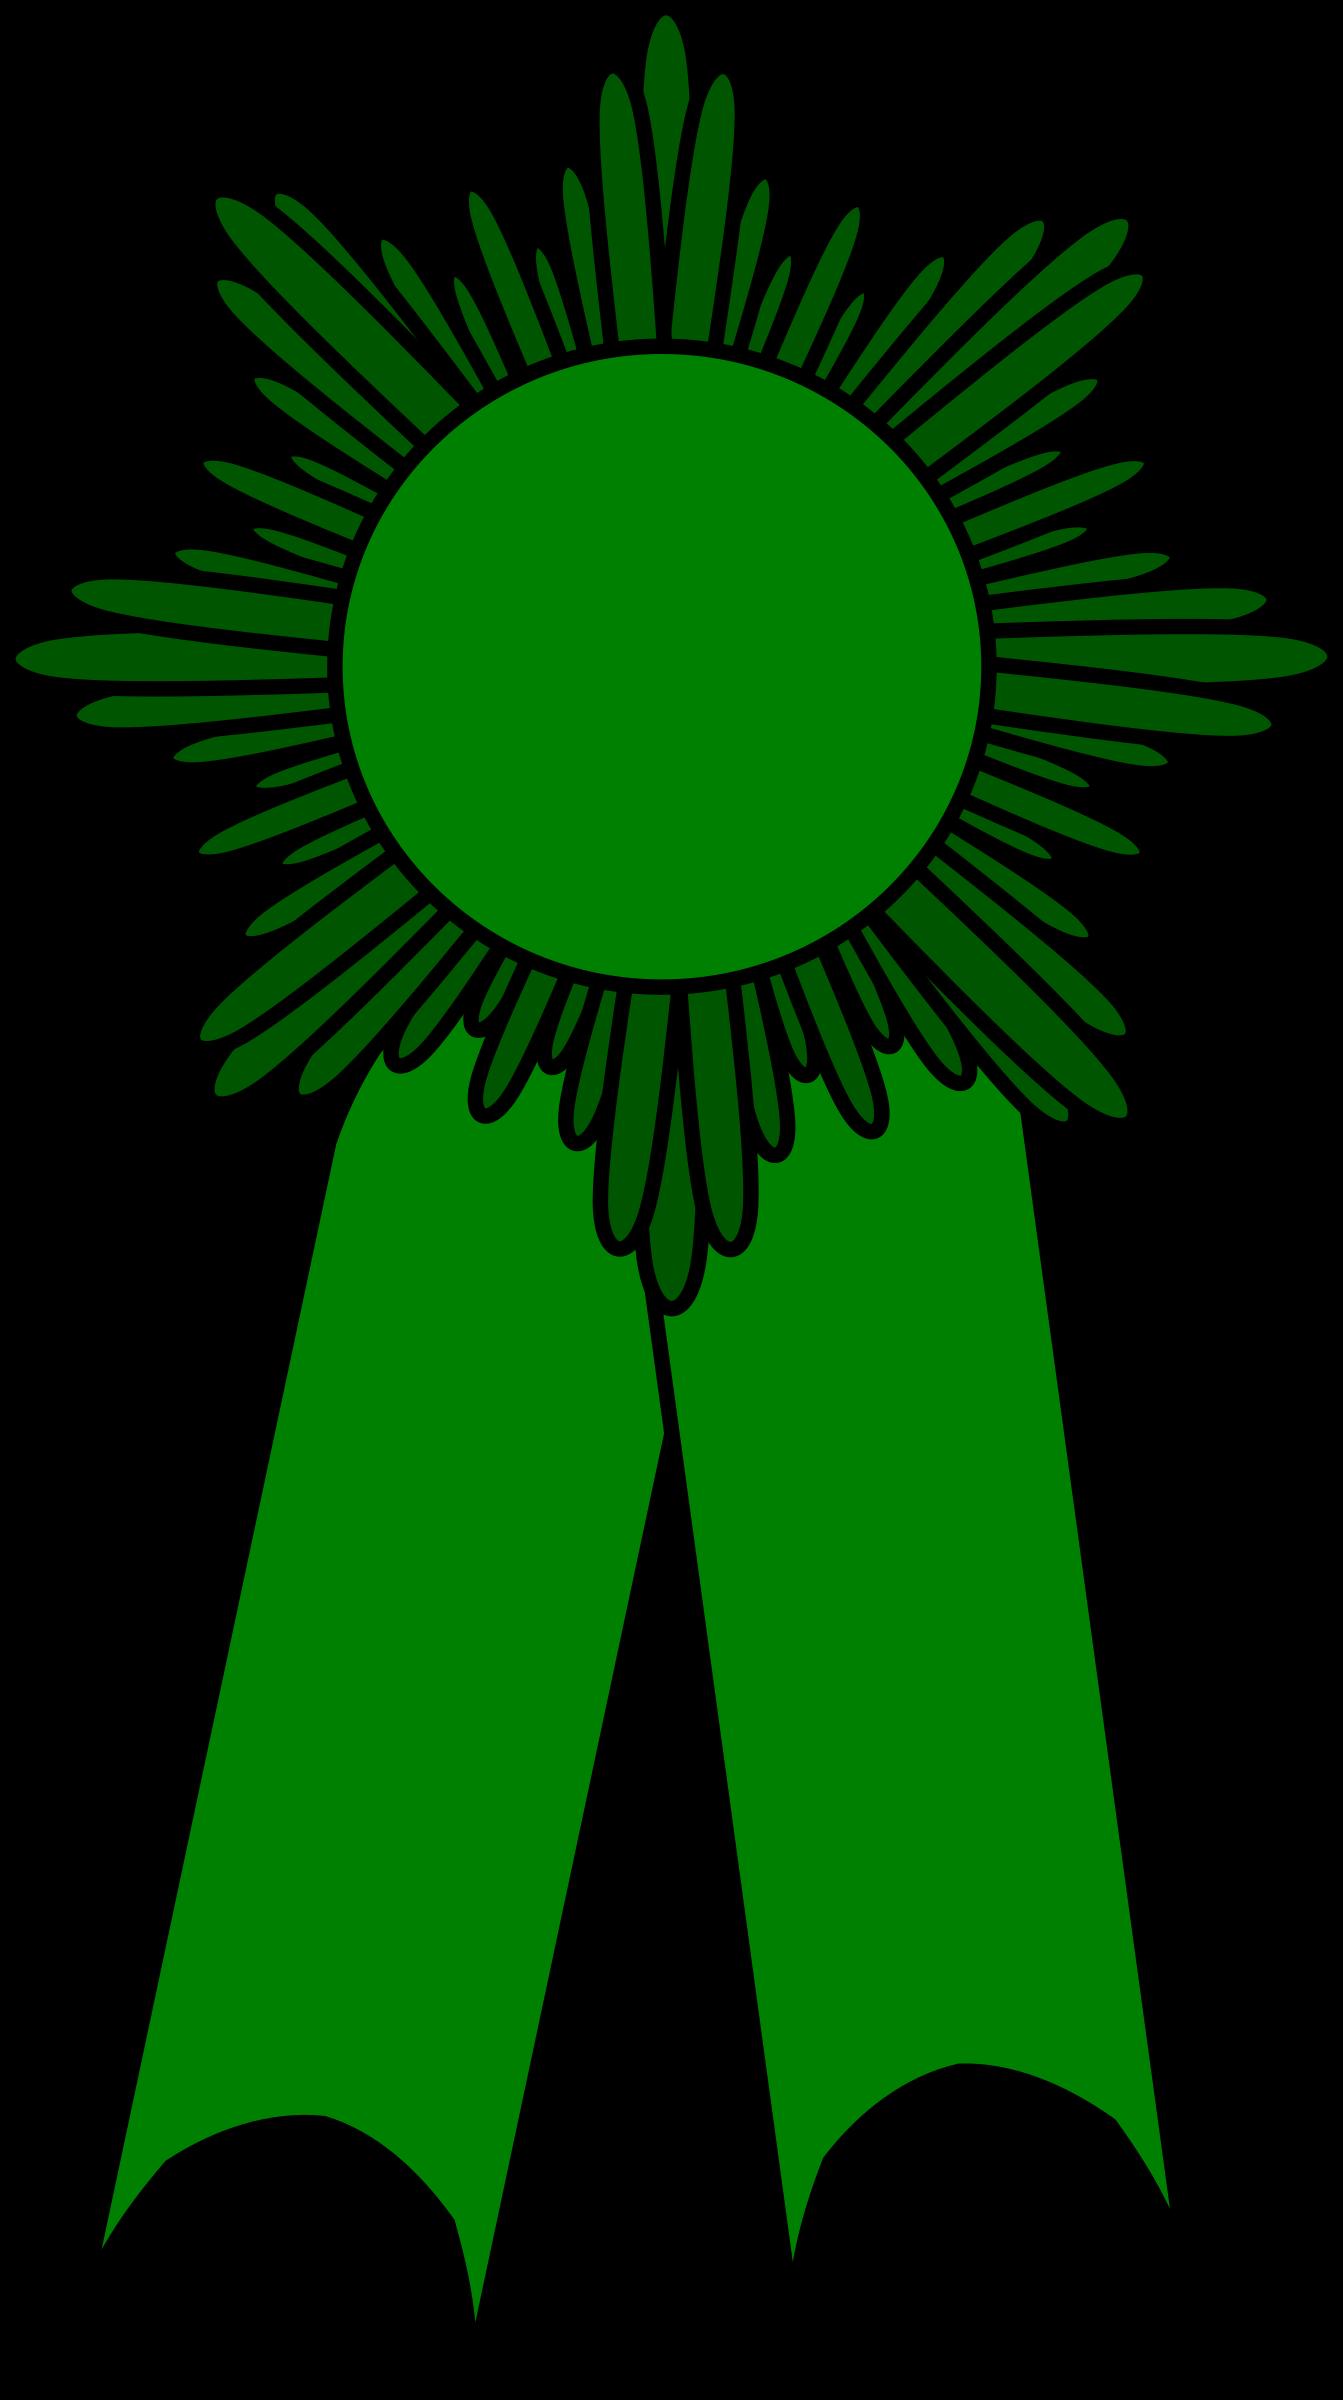 Clipart - prize ribbon green